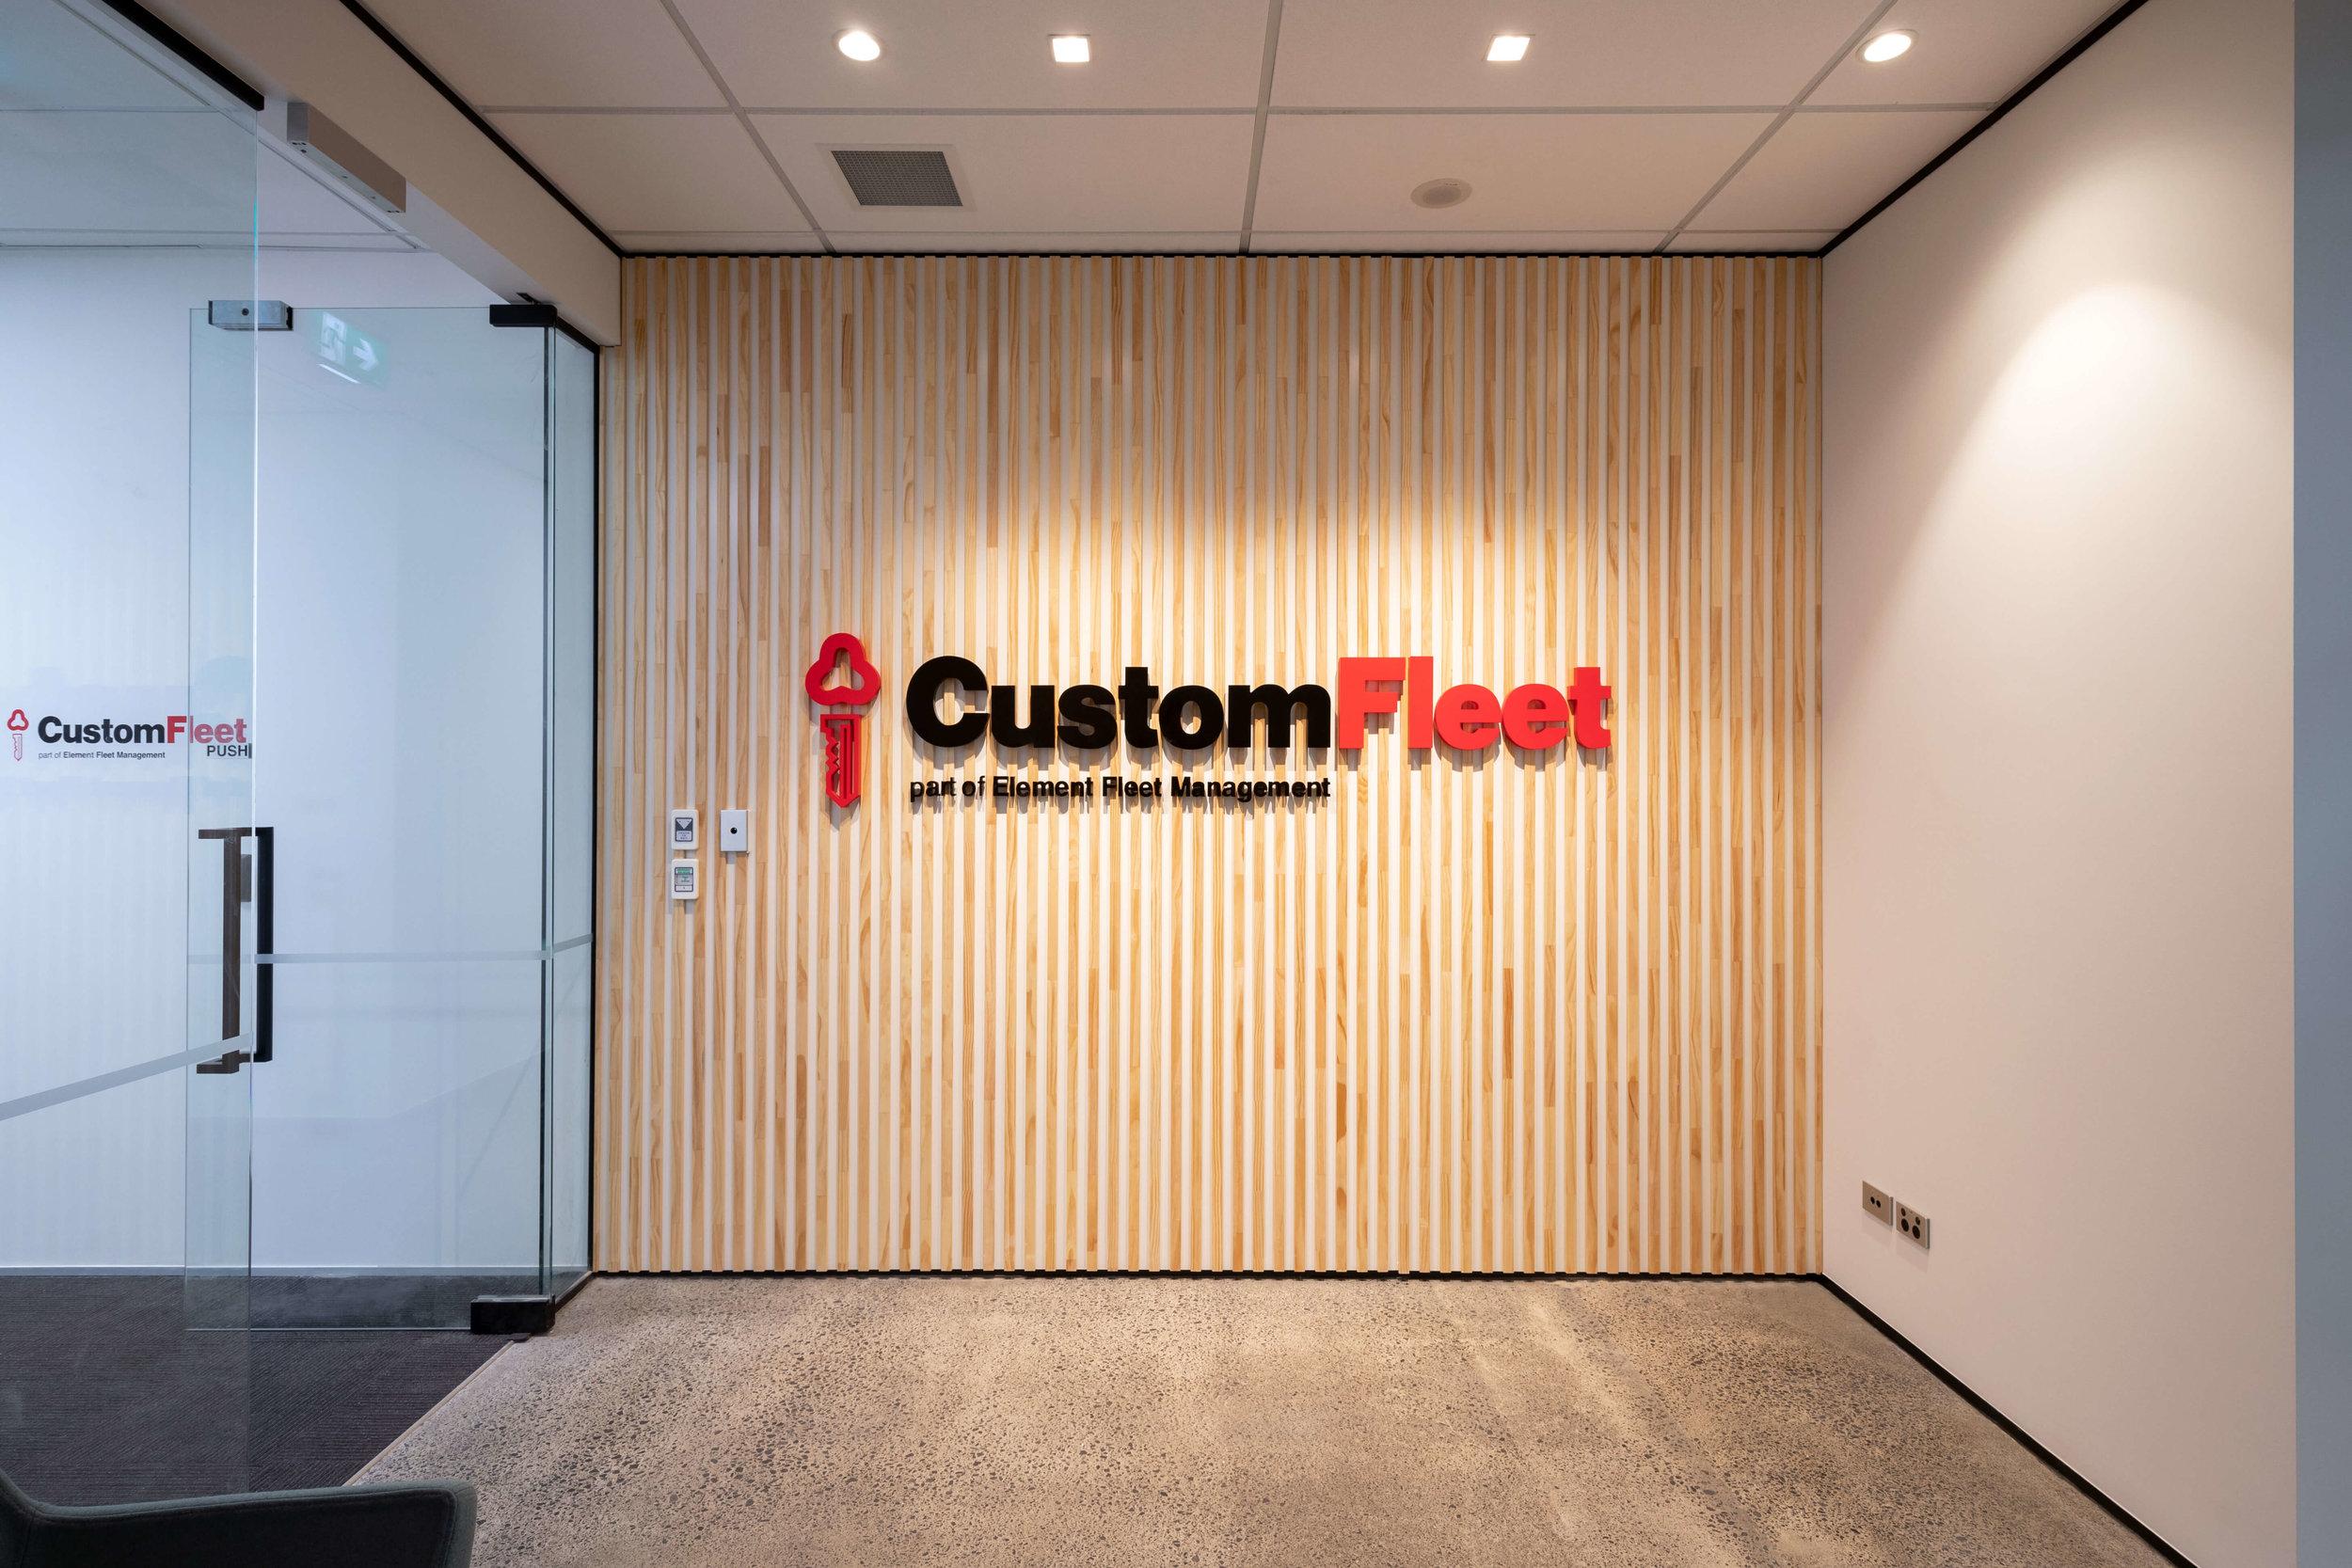 Custom Fleet Office Refurb.jpg